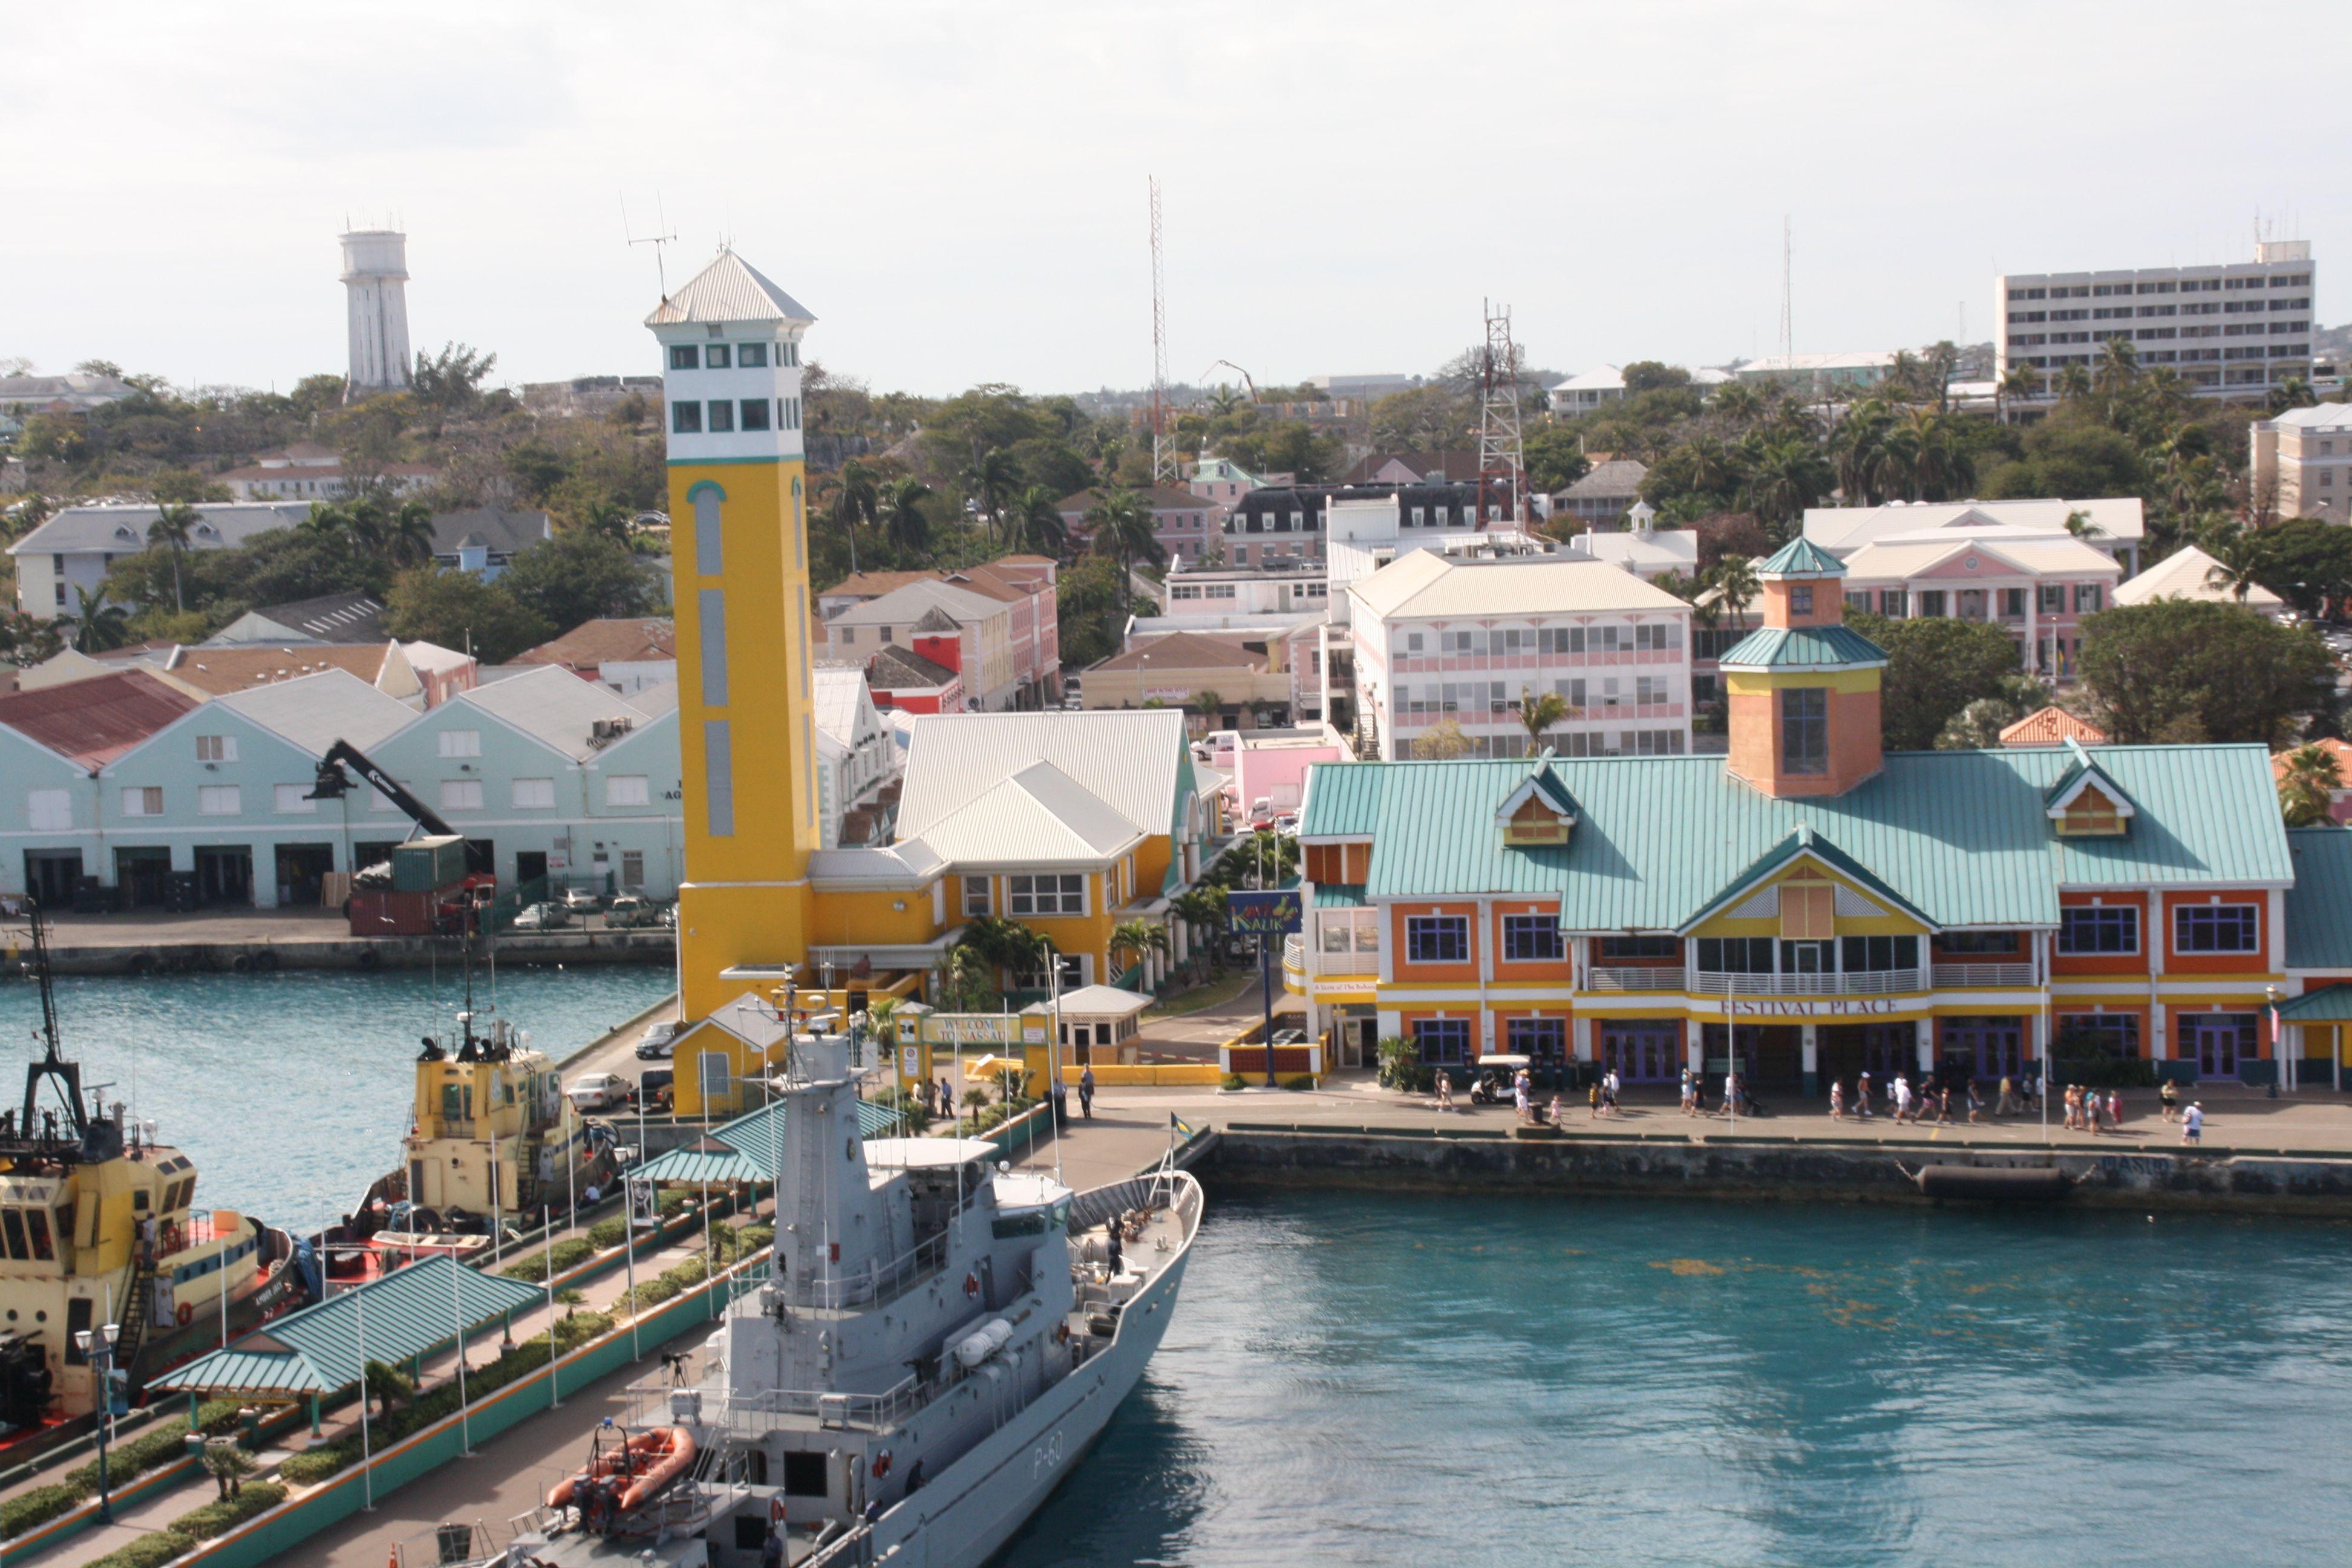 Disney Cruise Line Trip Report – Day 2